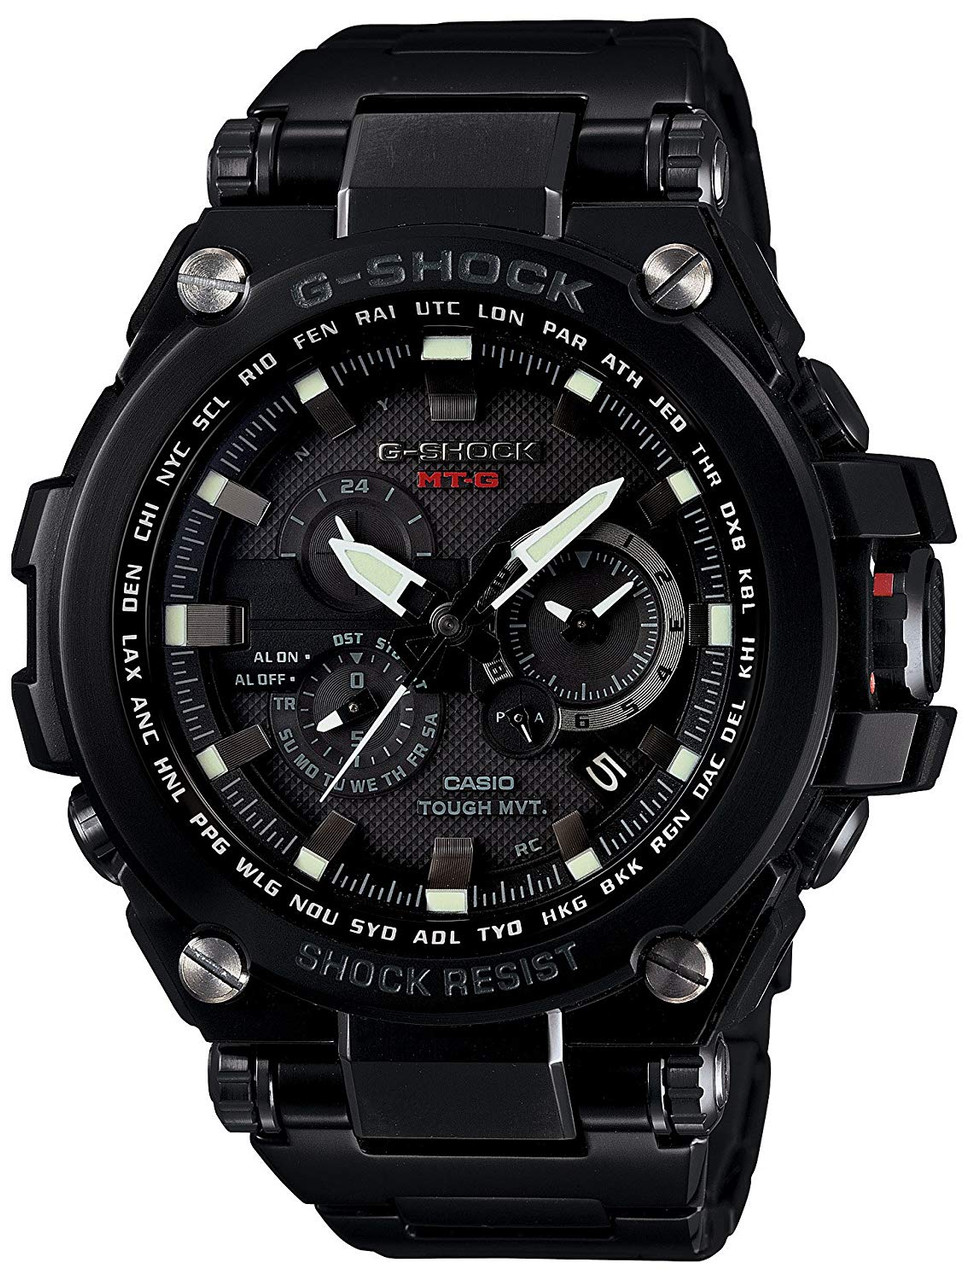 Casio G-Shock MTG-S1000BD-1AJF Premium Line